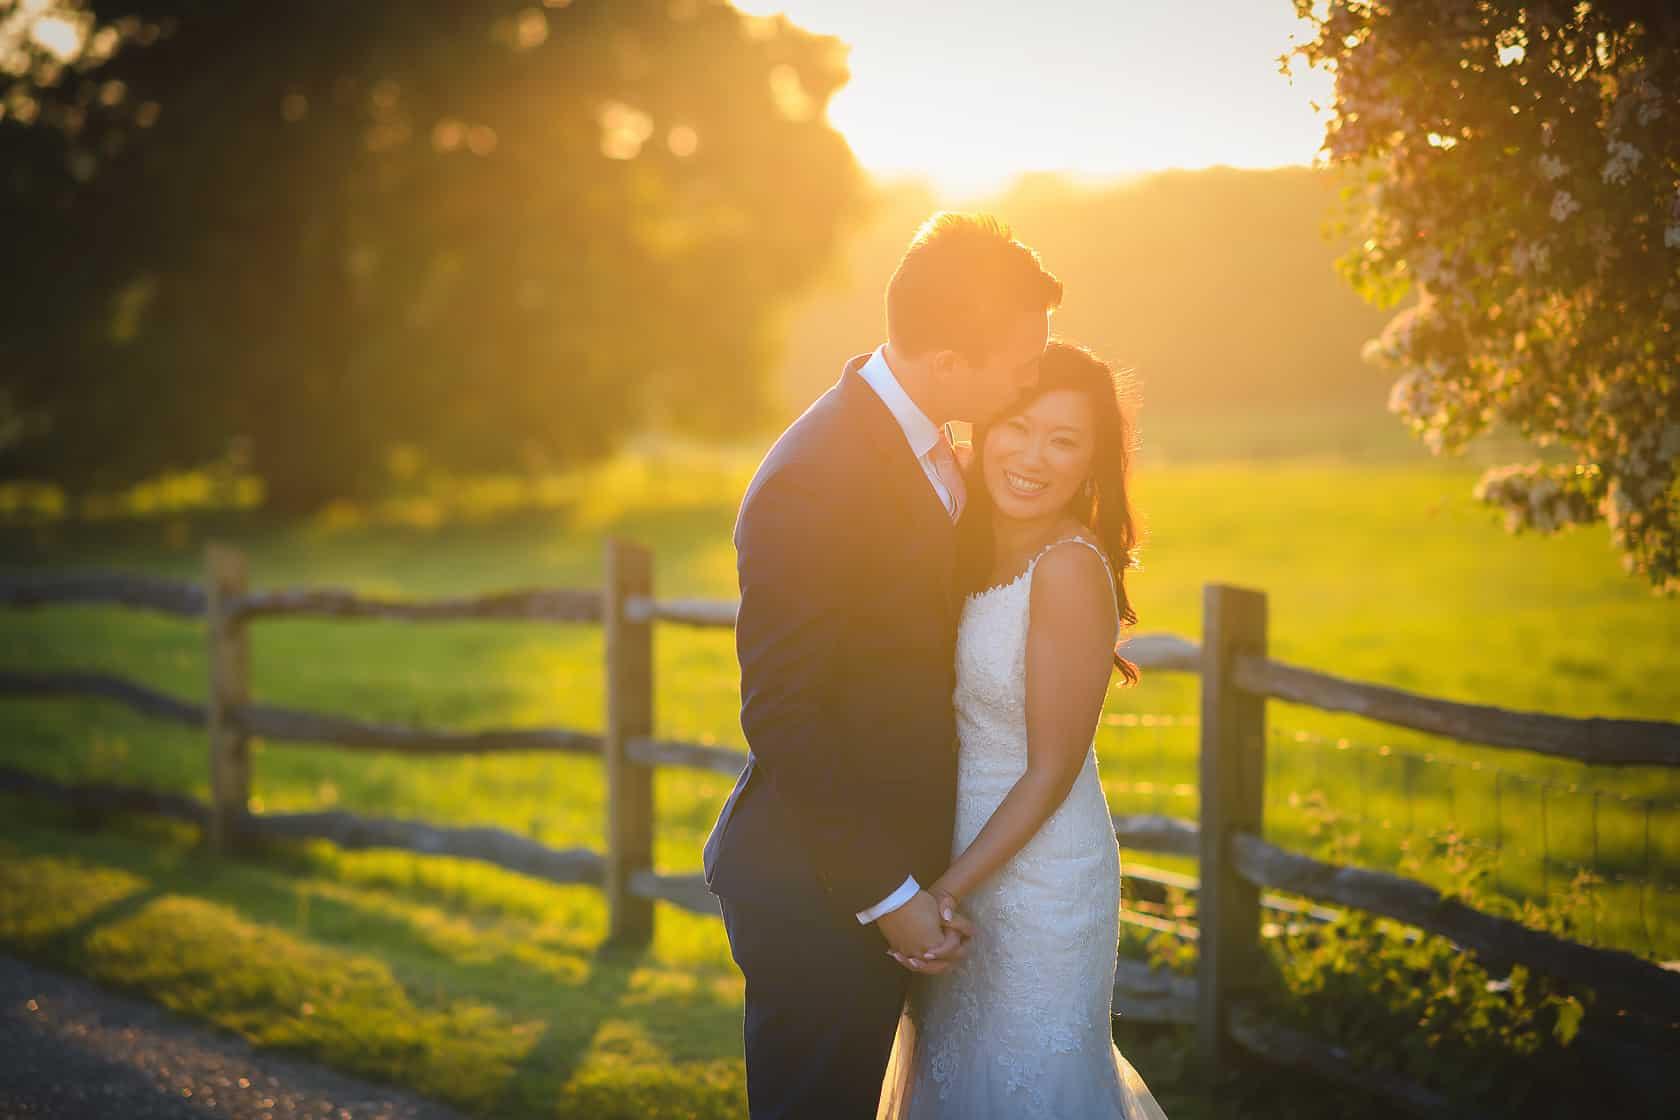 Best_Wedding_Photography_2018_Wedding-Photographer-Essex-and-London_046